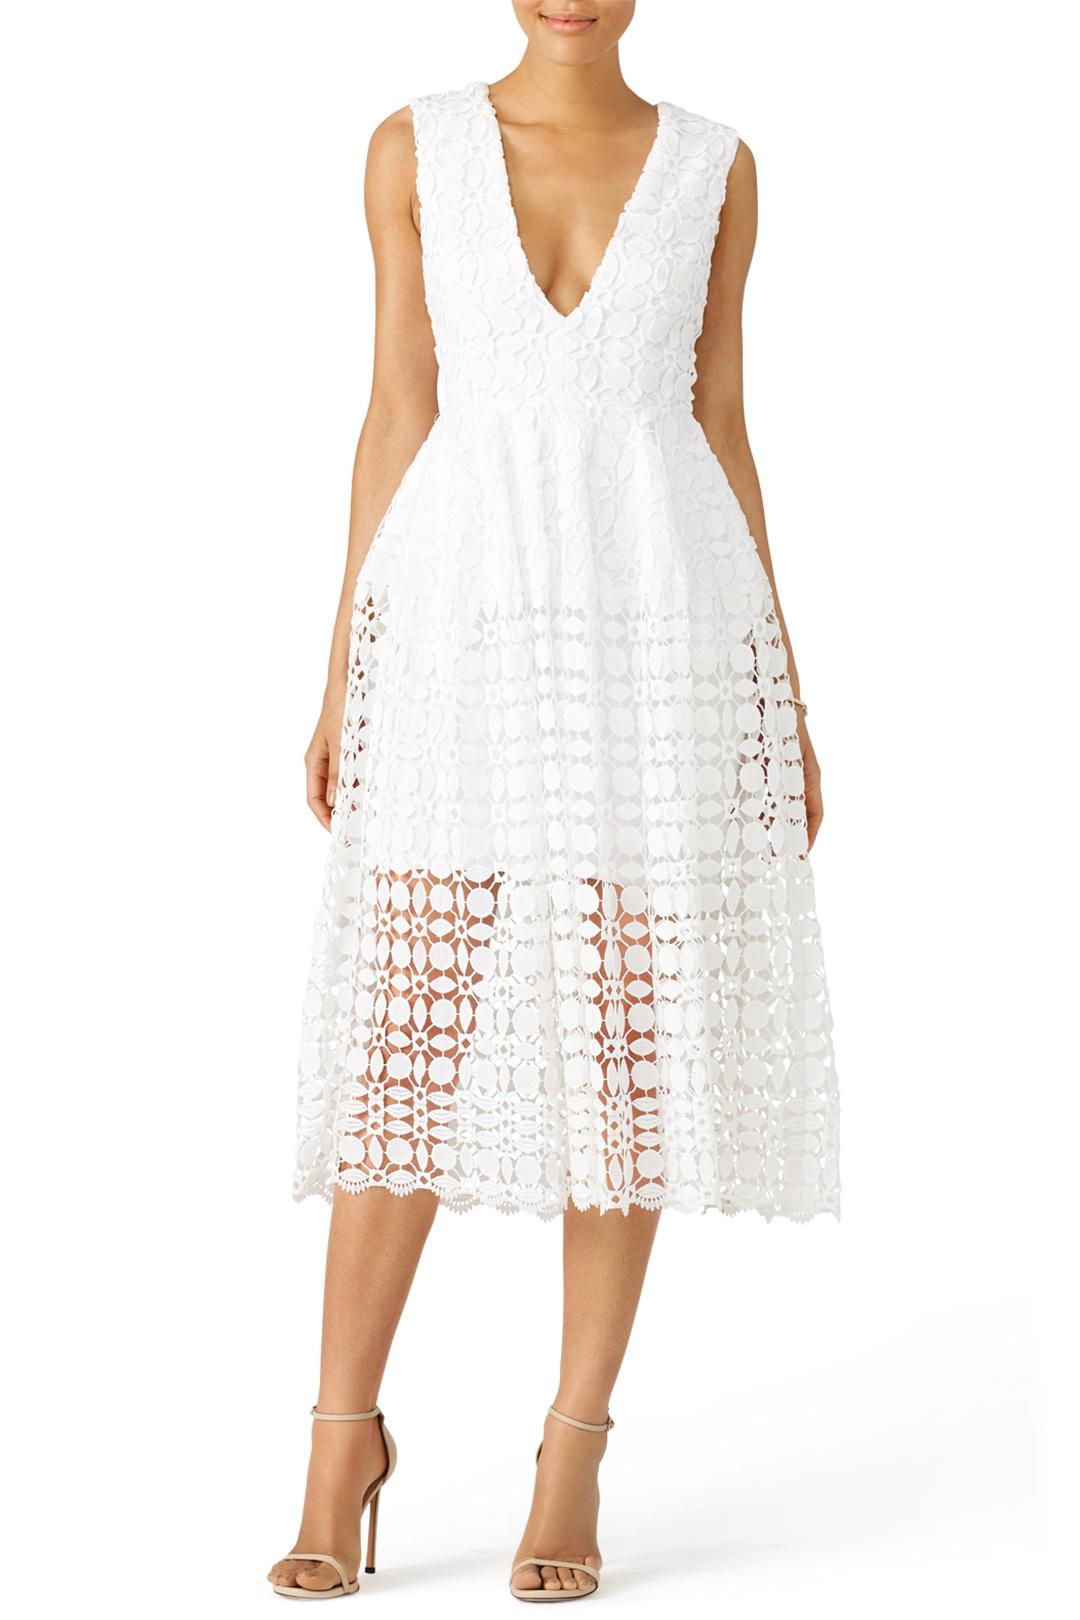 Nicholas Tiered Lace Dress